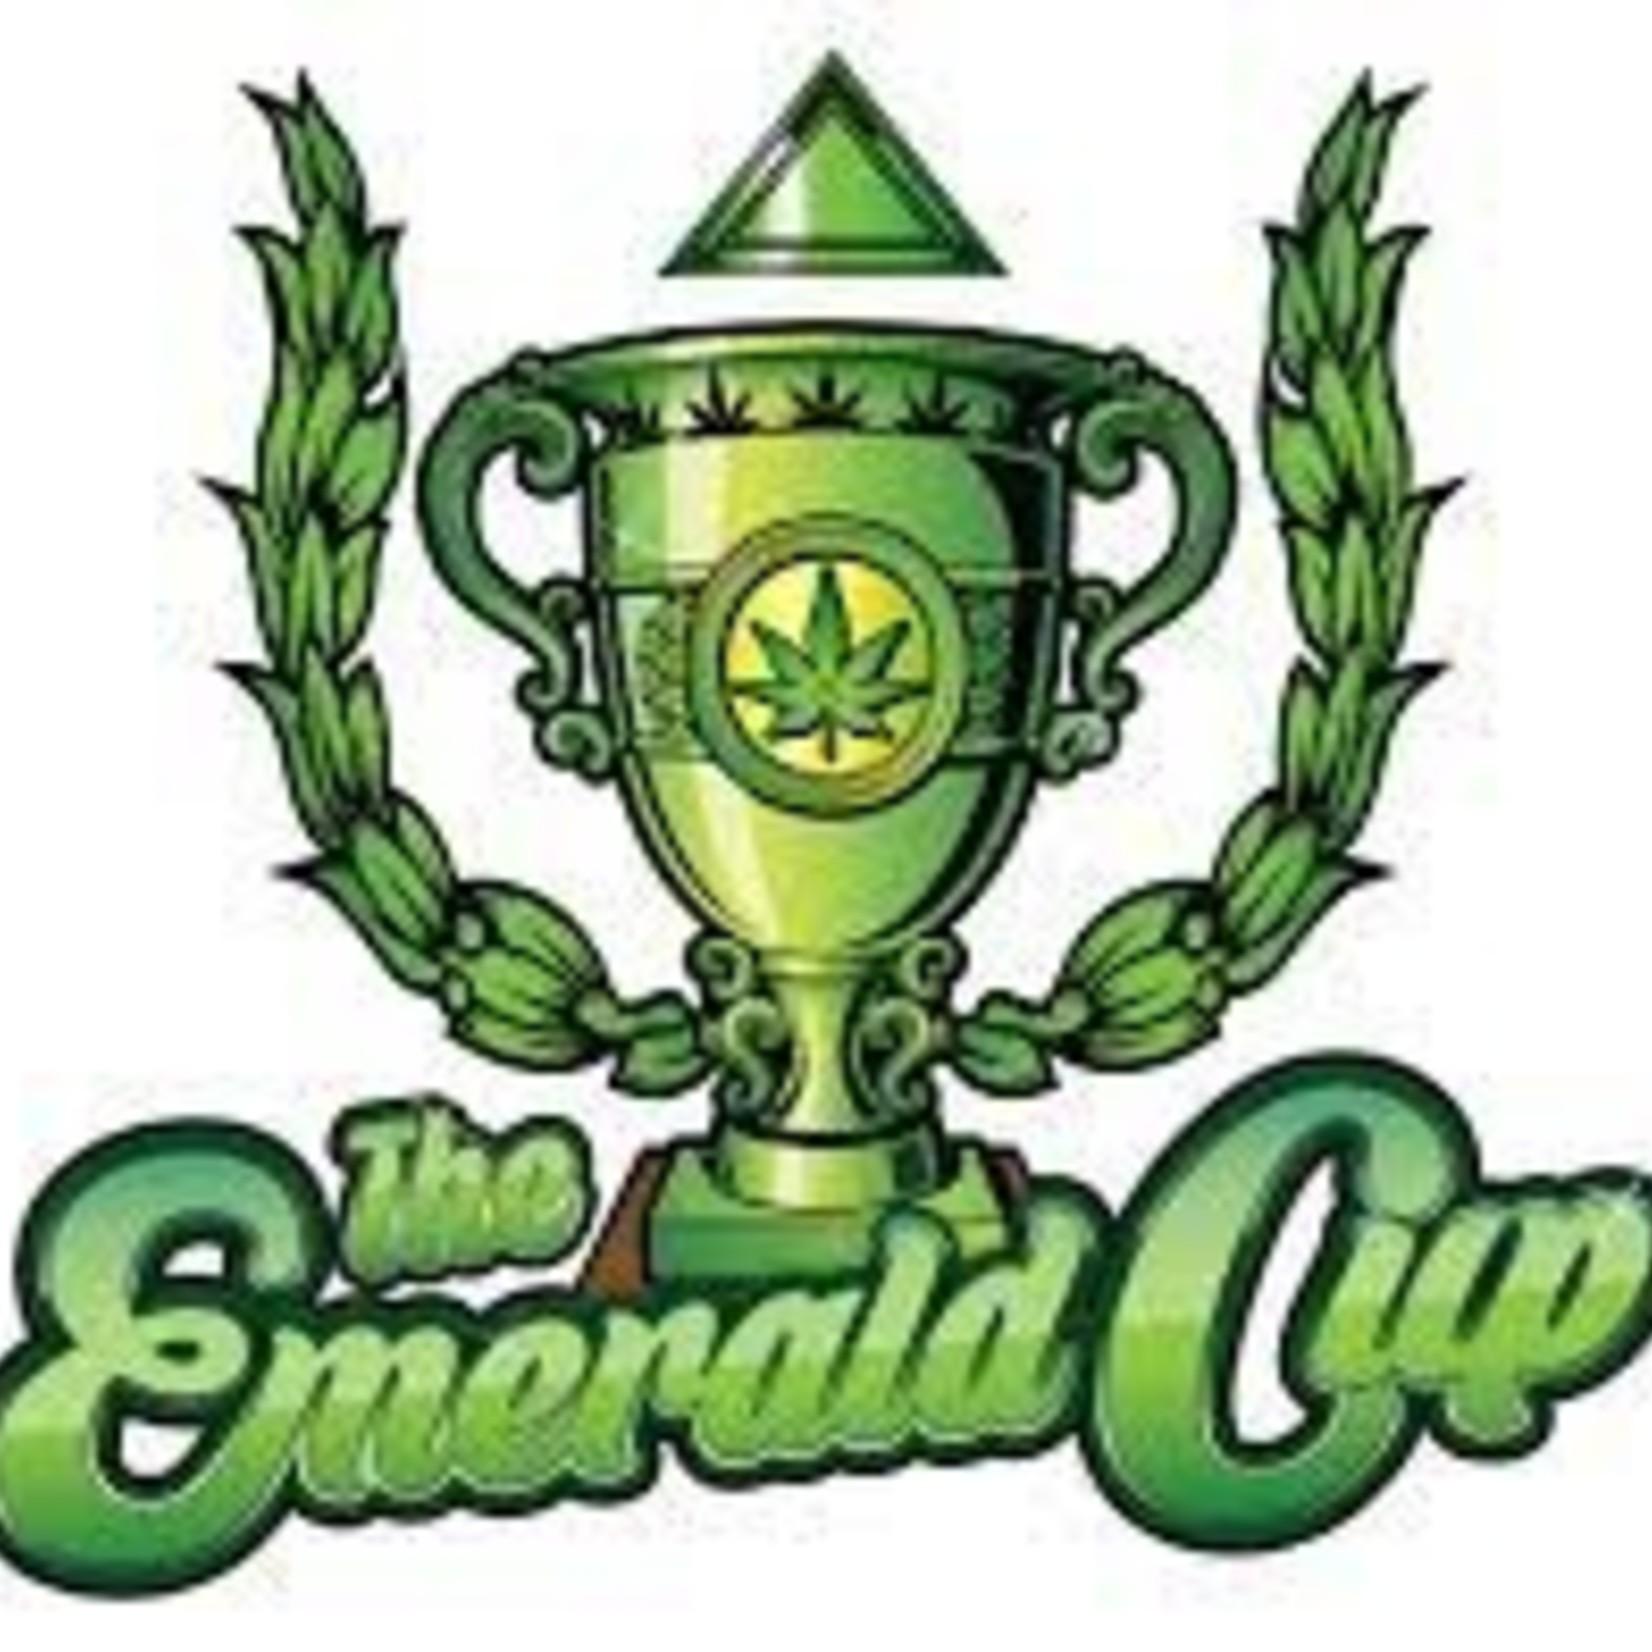 Emerald Cup / Ambrosia